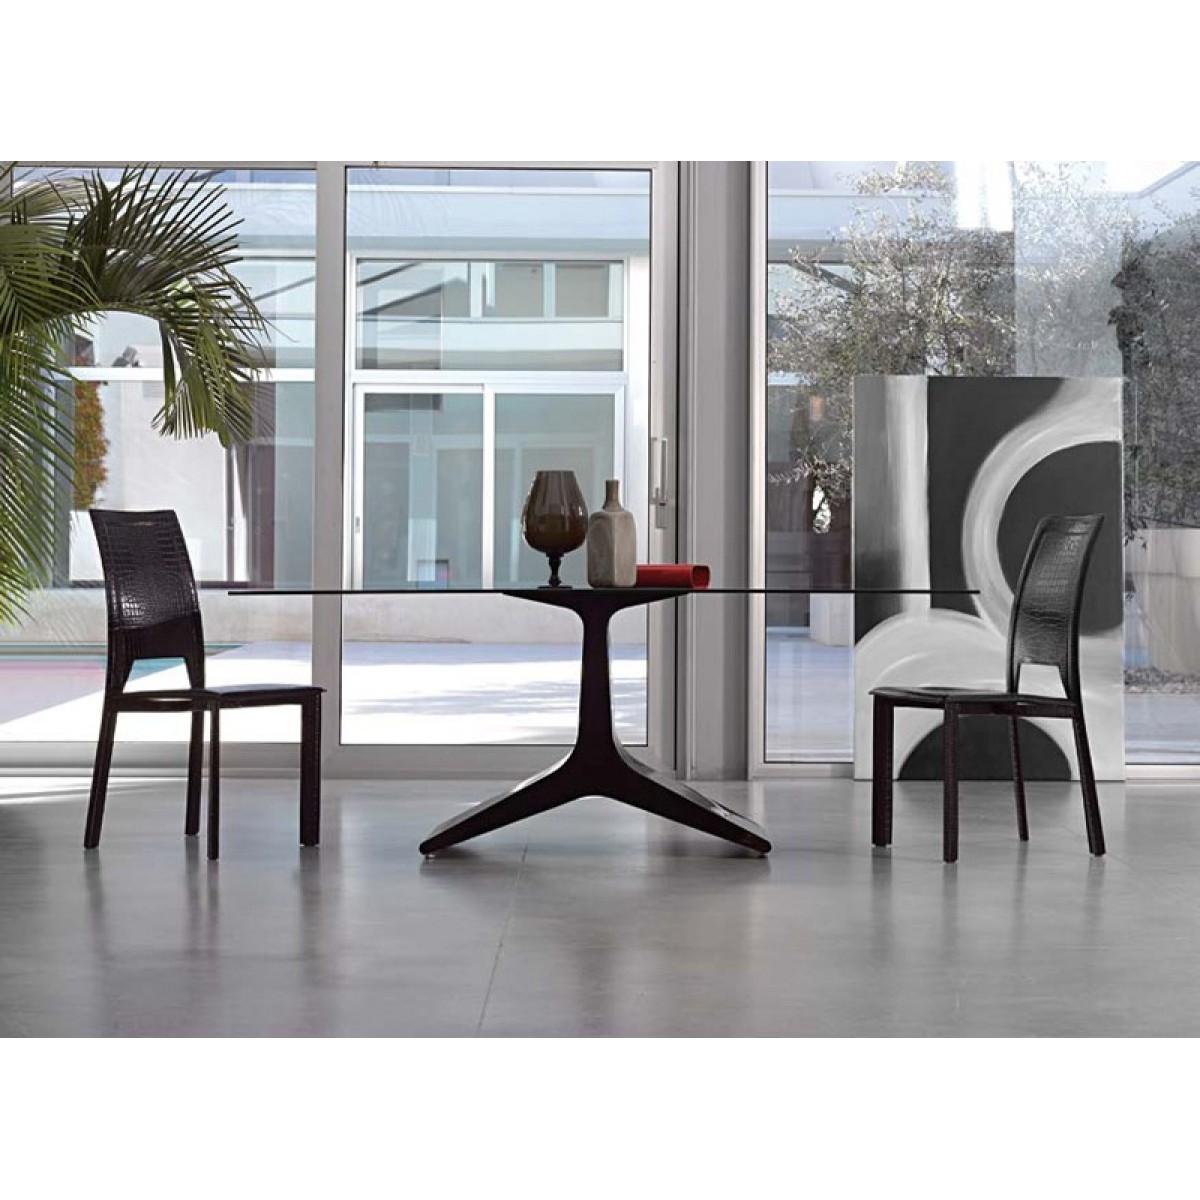 Stół model REALE